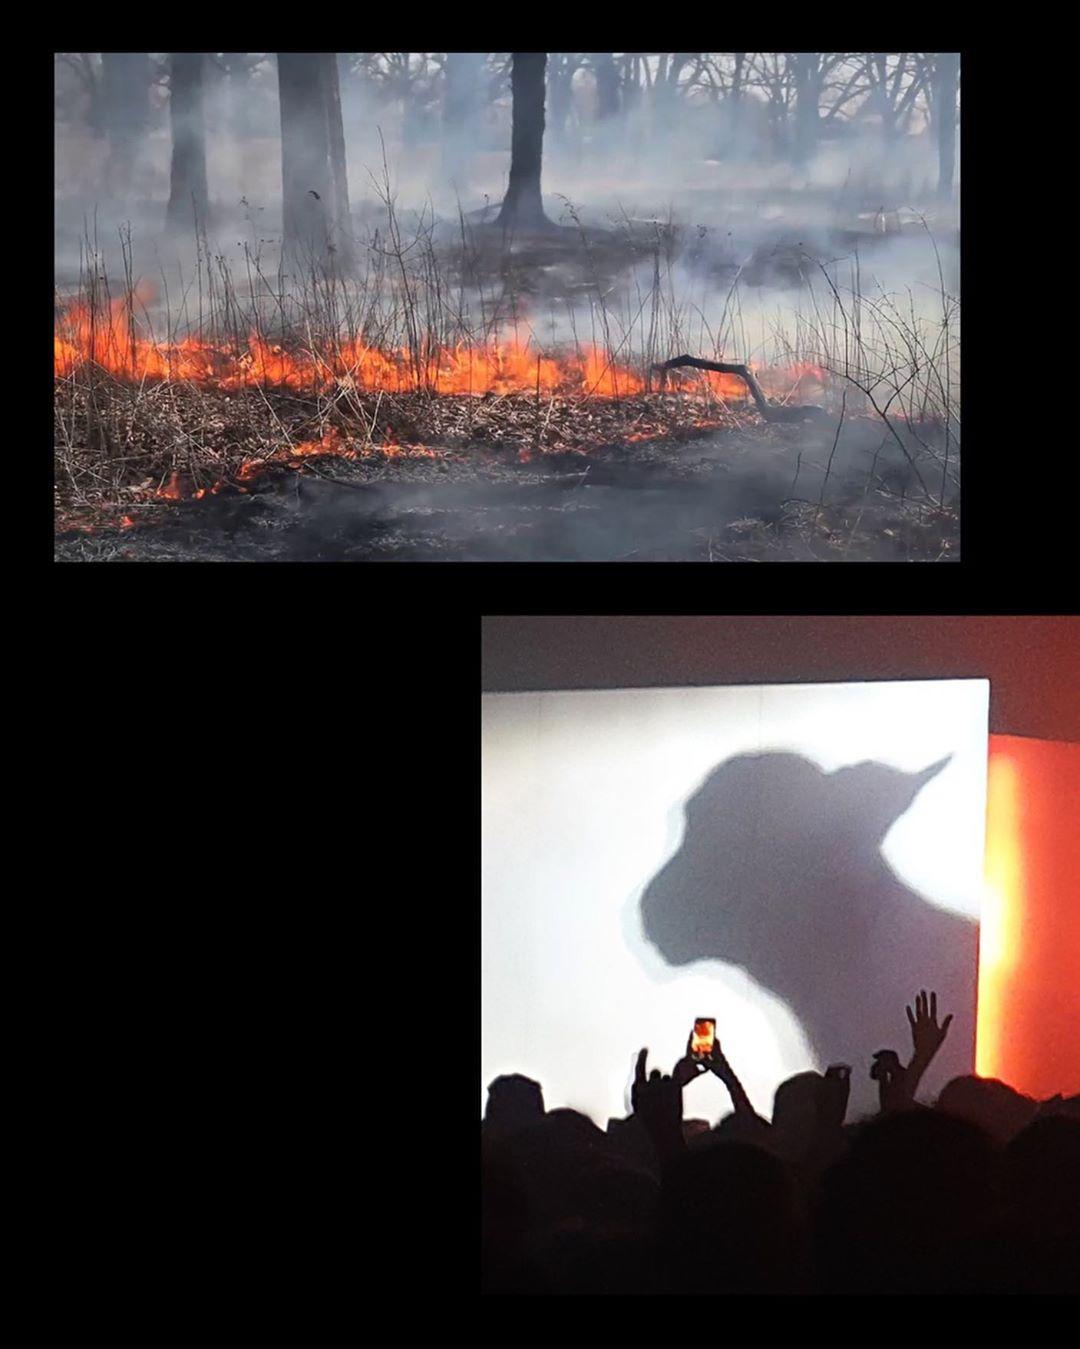 The Blaze - Territory Tour w/ @theblazeprod @animal63music @livenationfr #2018